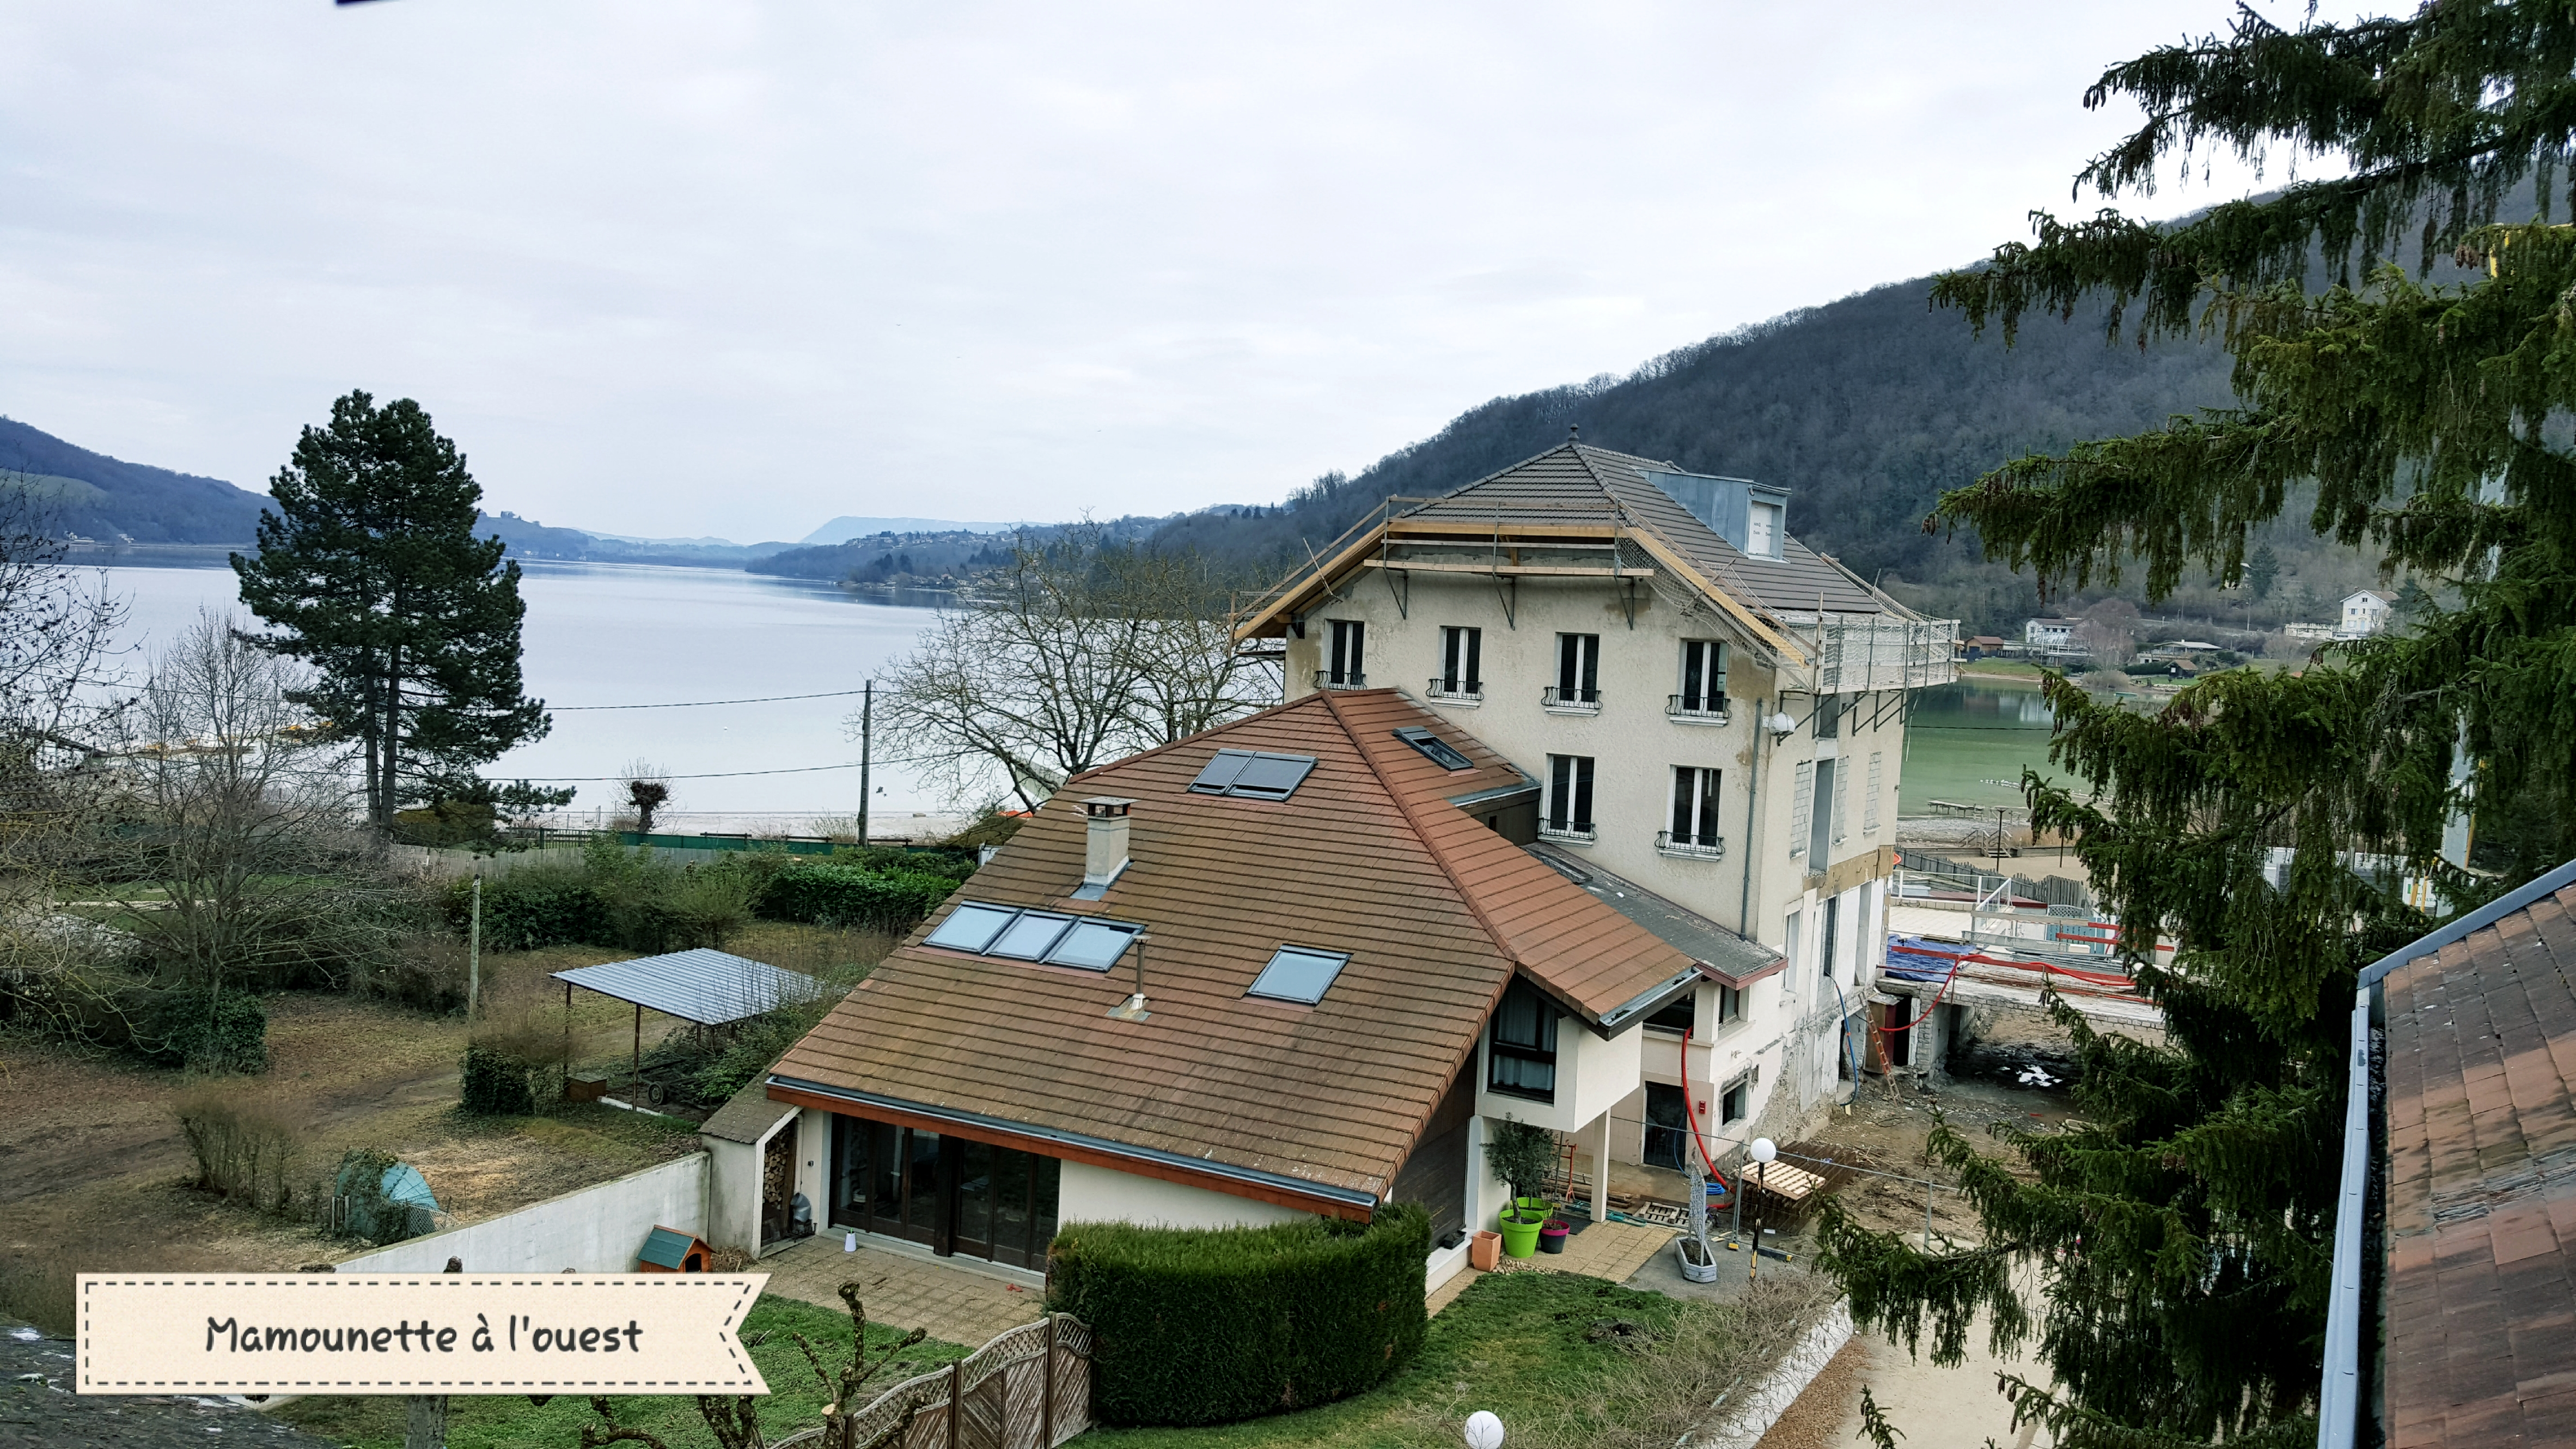 Hôtel le beau rivage charavines.jpg